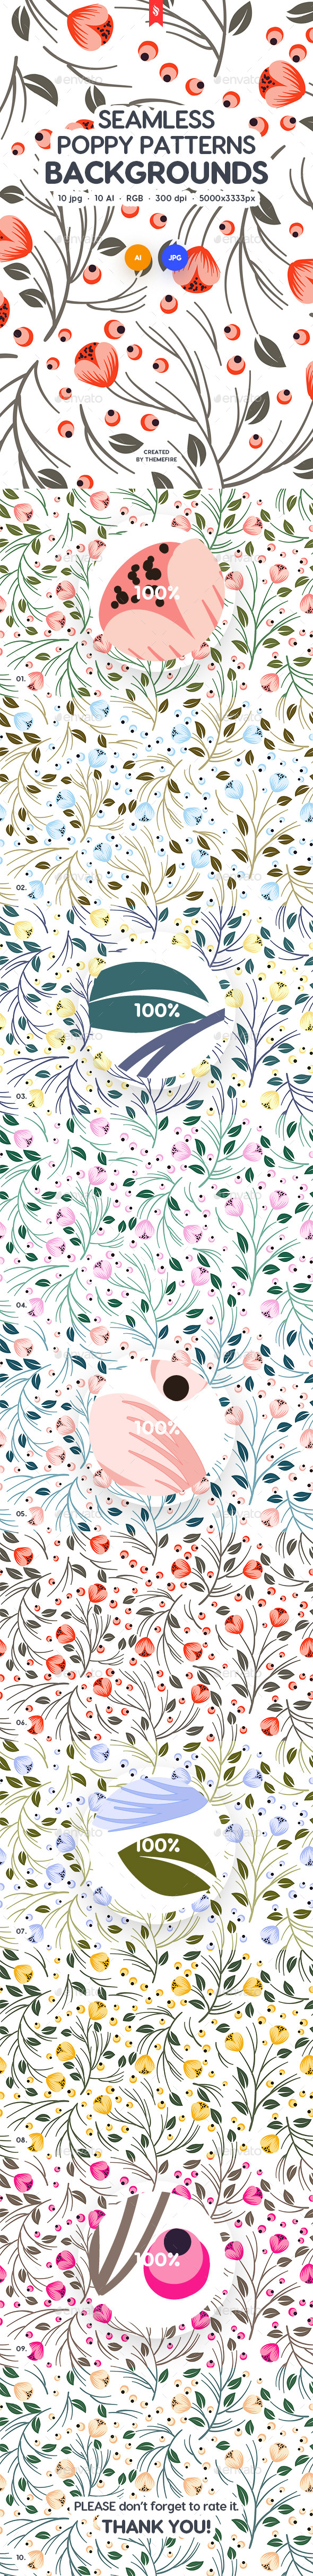 Seamless Patterns Floral Poppy Backgrounds - Patterns Backgrounds